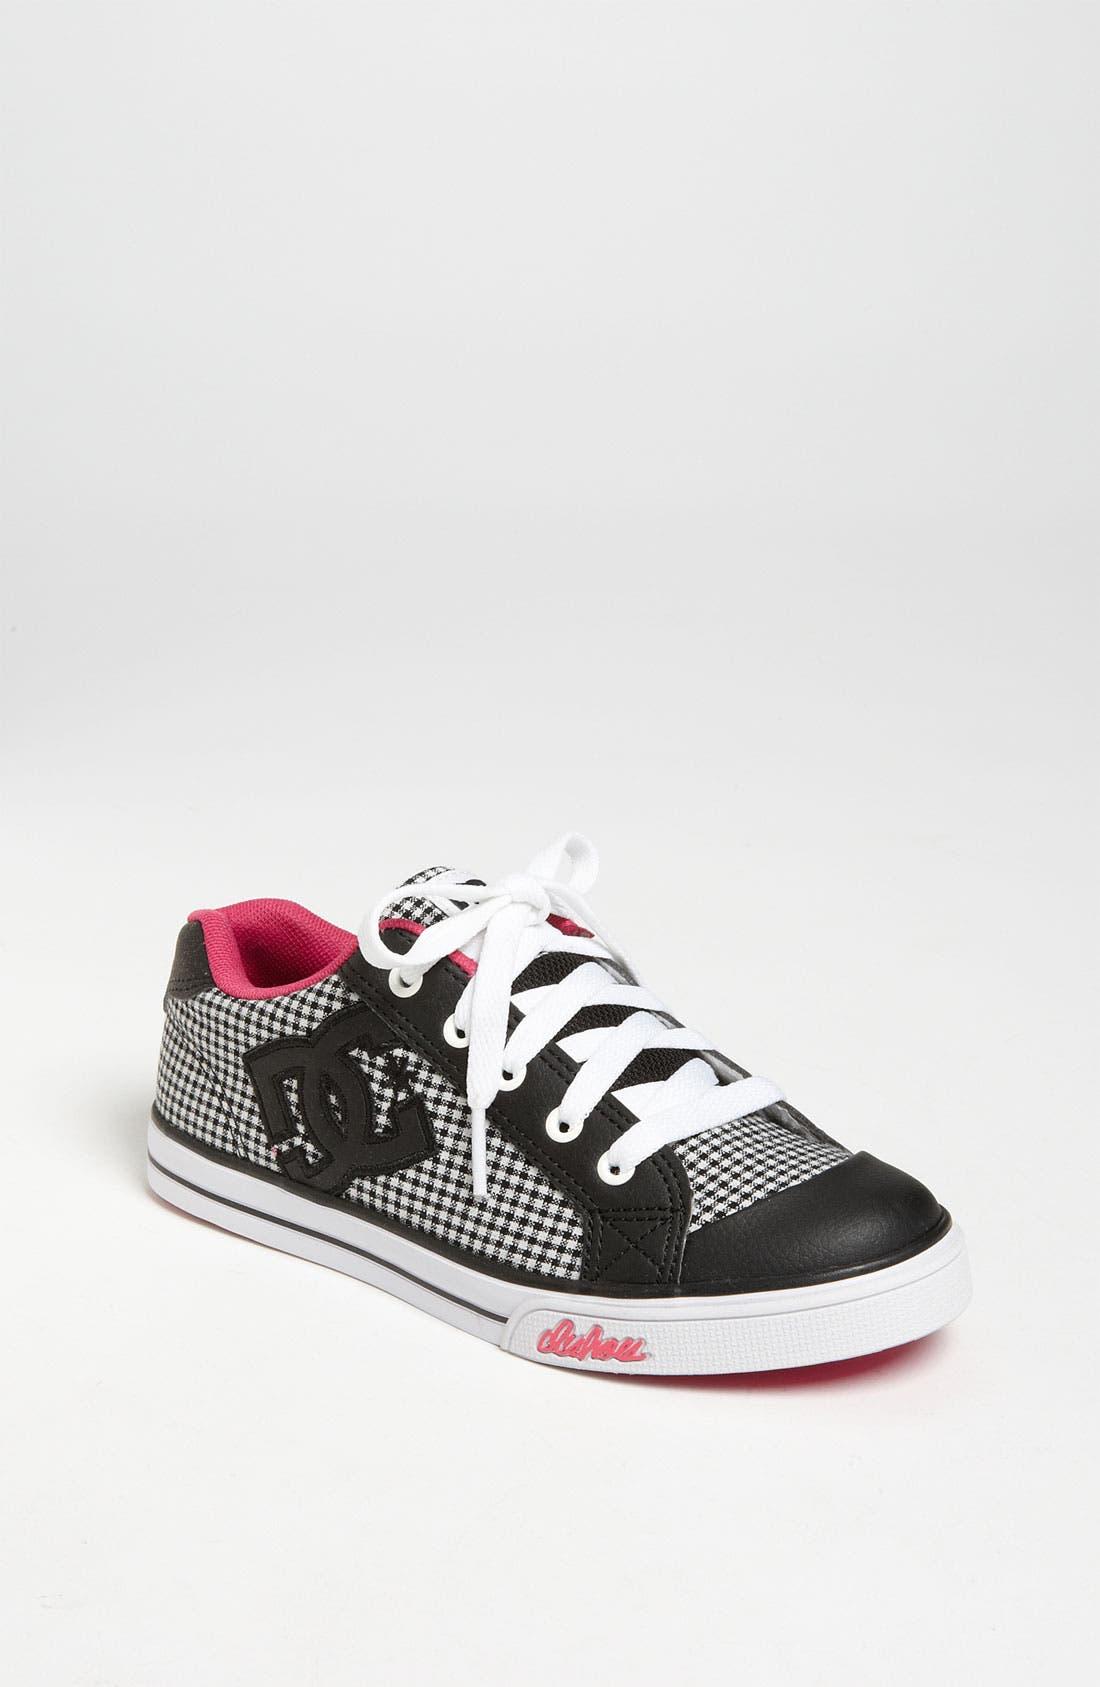 Alternate Image 1 Selected - DC Shoes 'Chelsea Charm' Sneaker (Toddler, Little Kid & Big Kid)